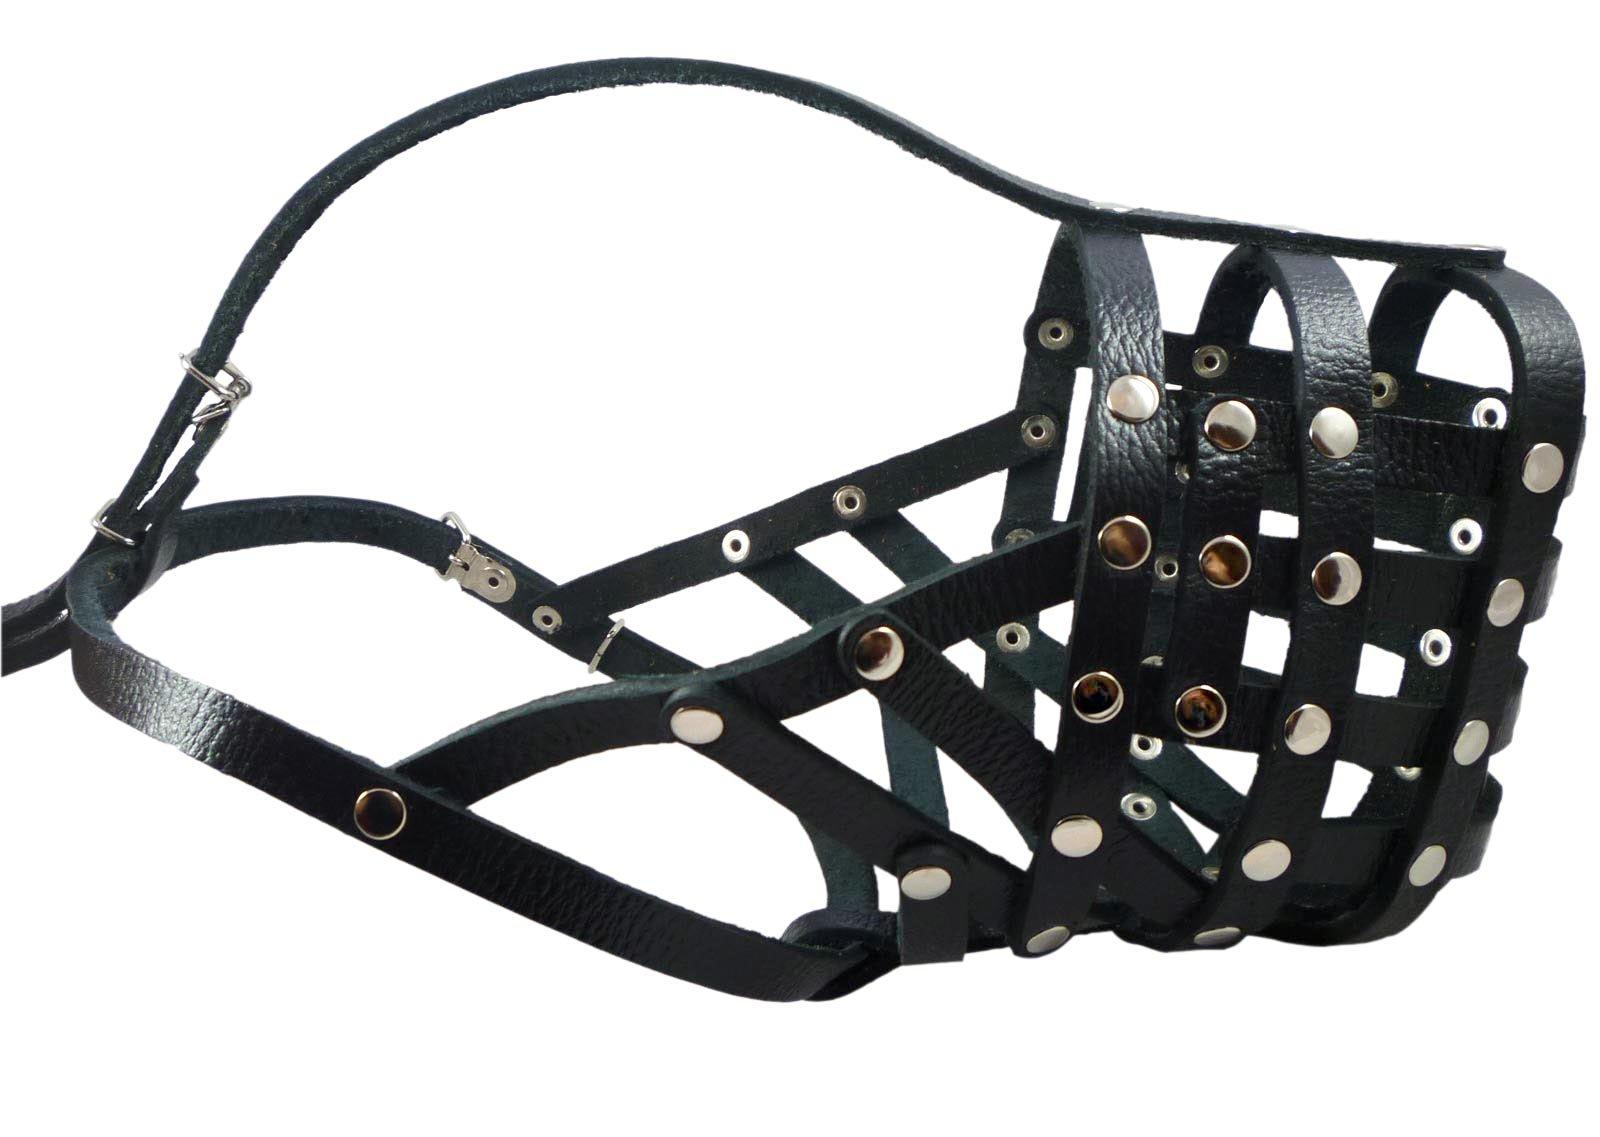 Secure Leather Mesh Basket Dog Muzzle #16 Black - Great Dane, Saint Bernard, Mastiff (Circumference 15.5'', Snout Length 4.5'')